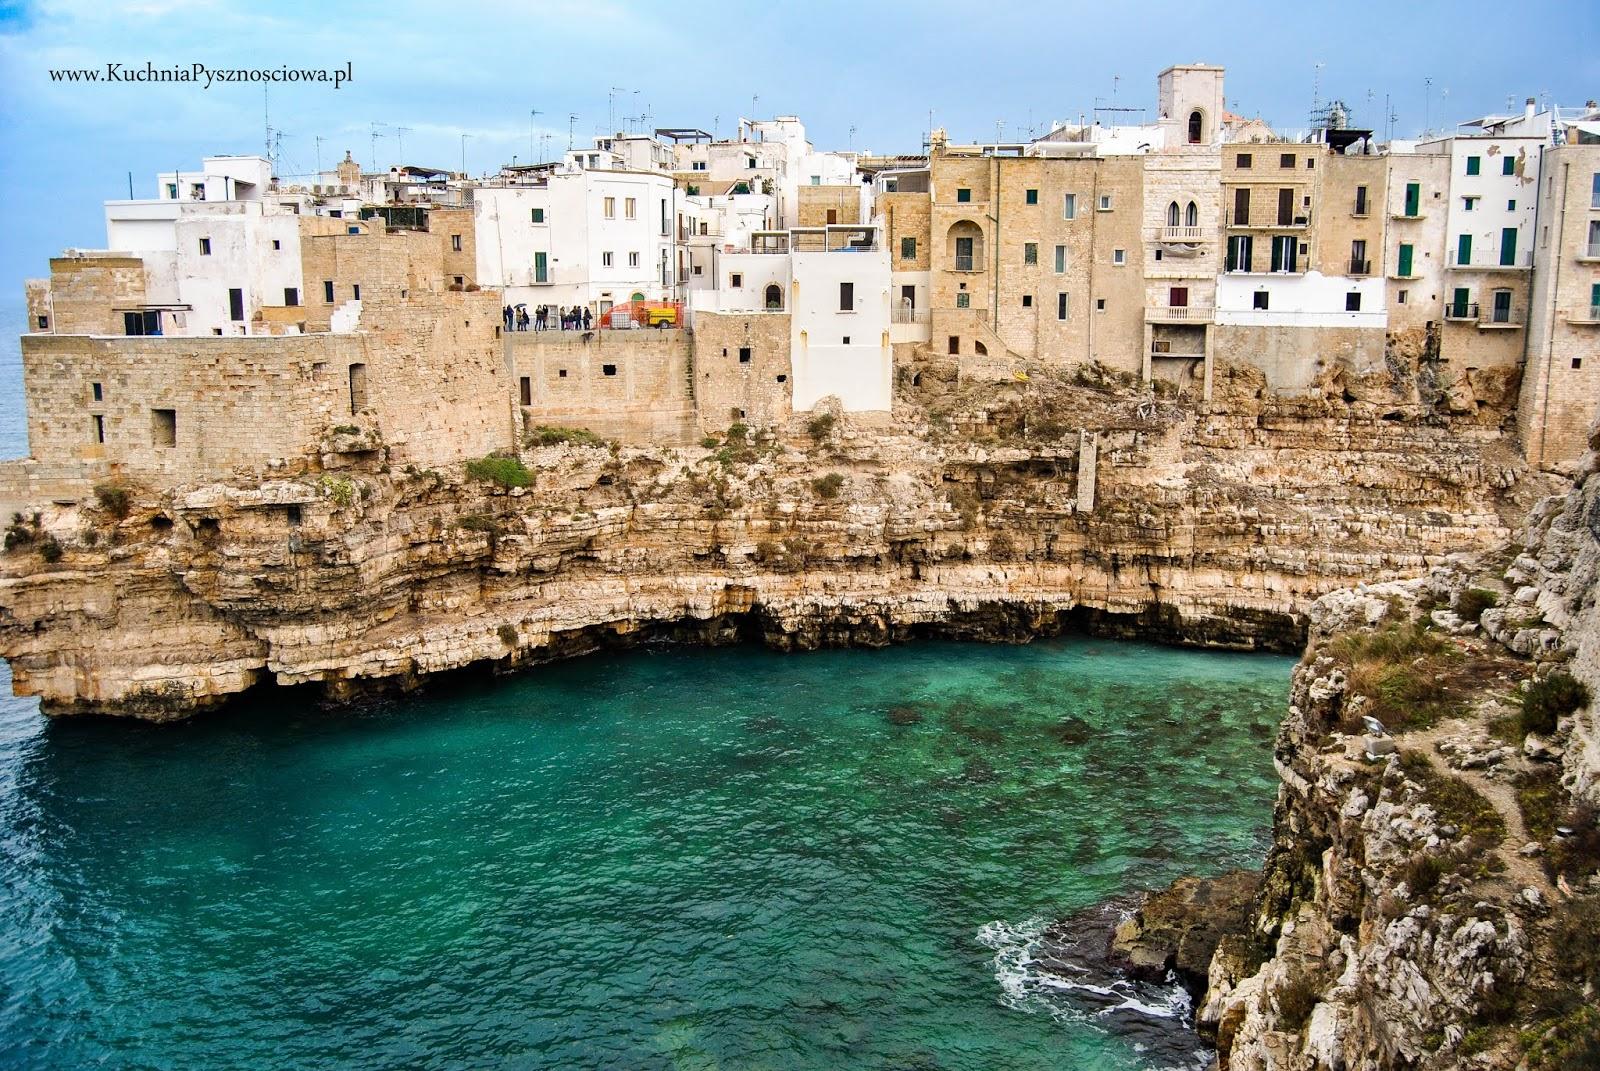 Apulia-Bari, Polignano a Mare i Alberobello z dzieckiem u boku